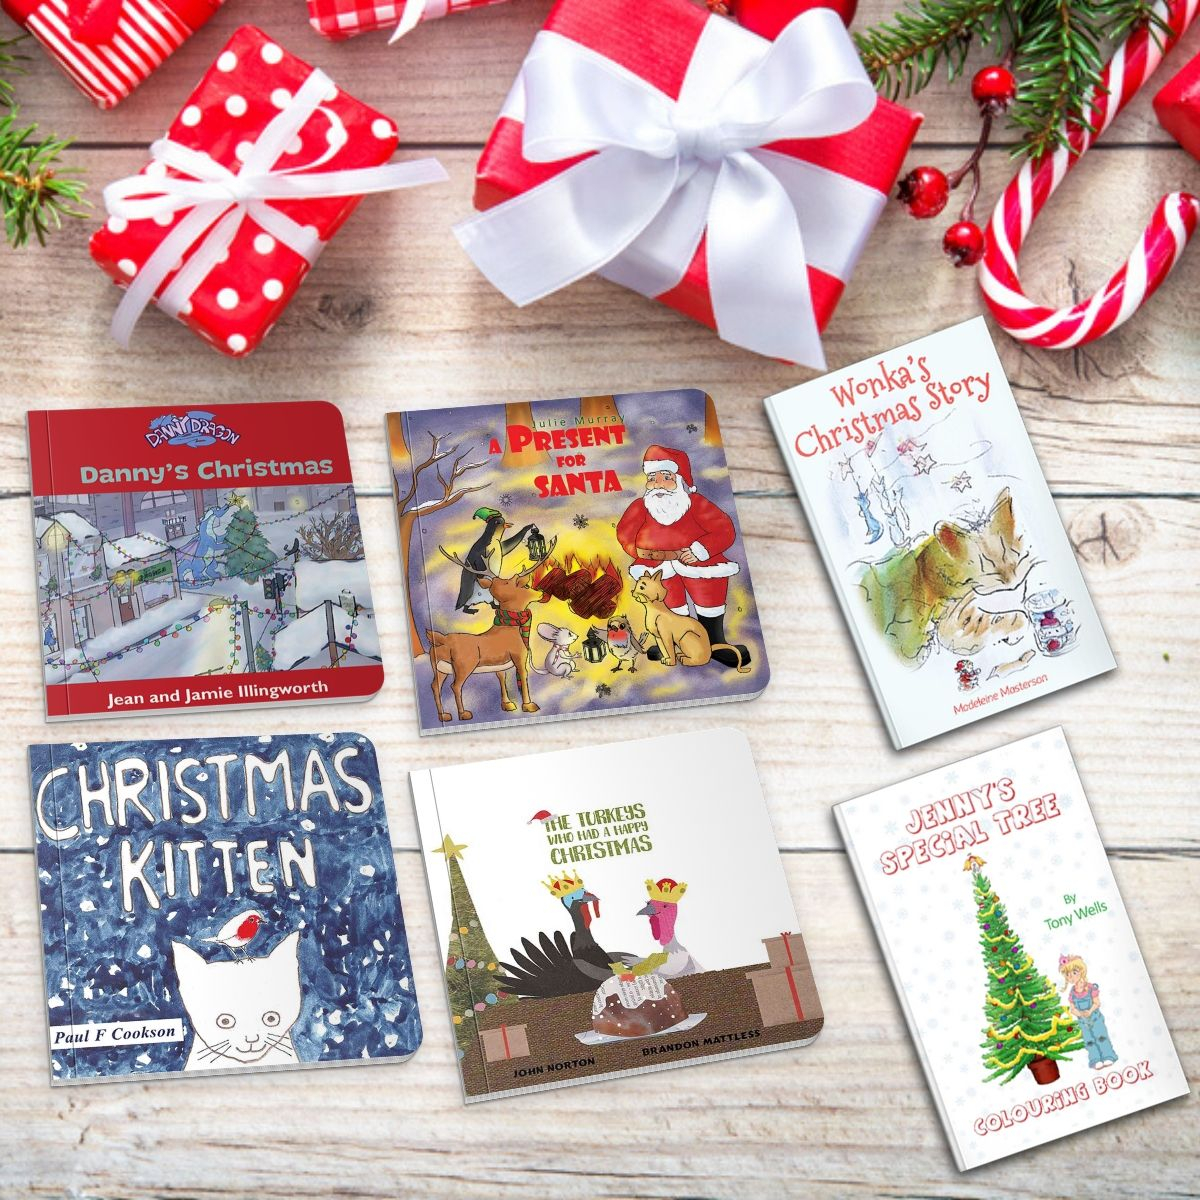 6 Perfectly Magical Christmas Eve Titles!   Austin Macauley